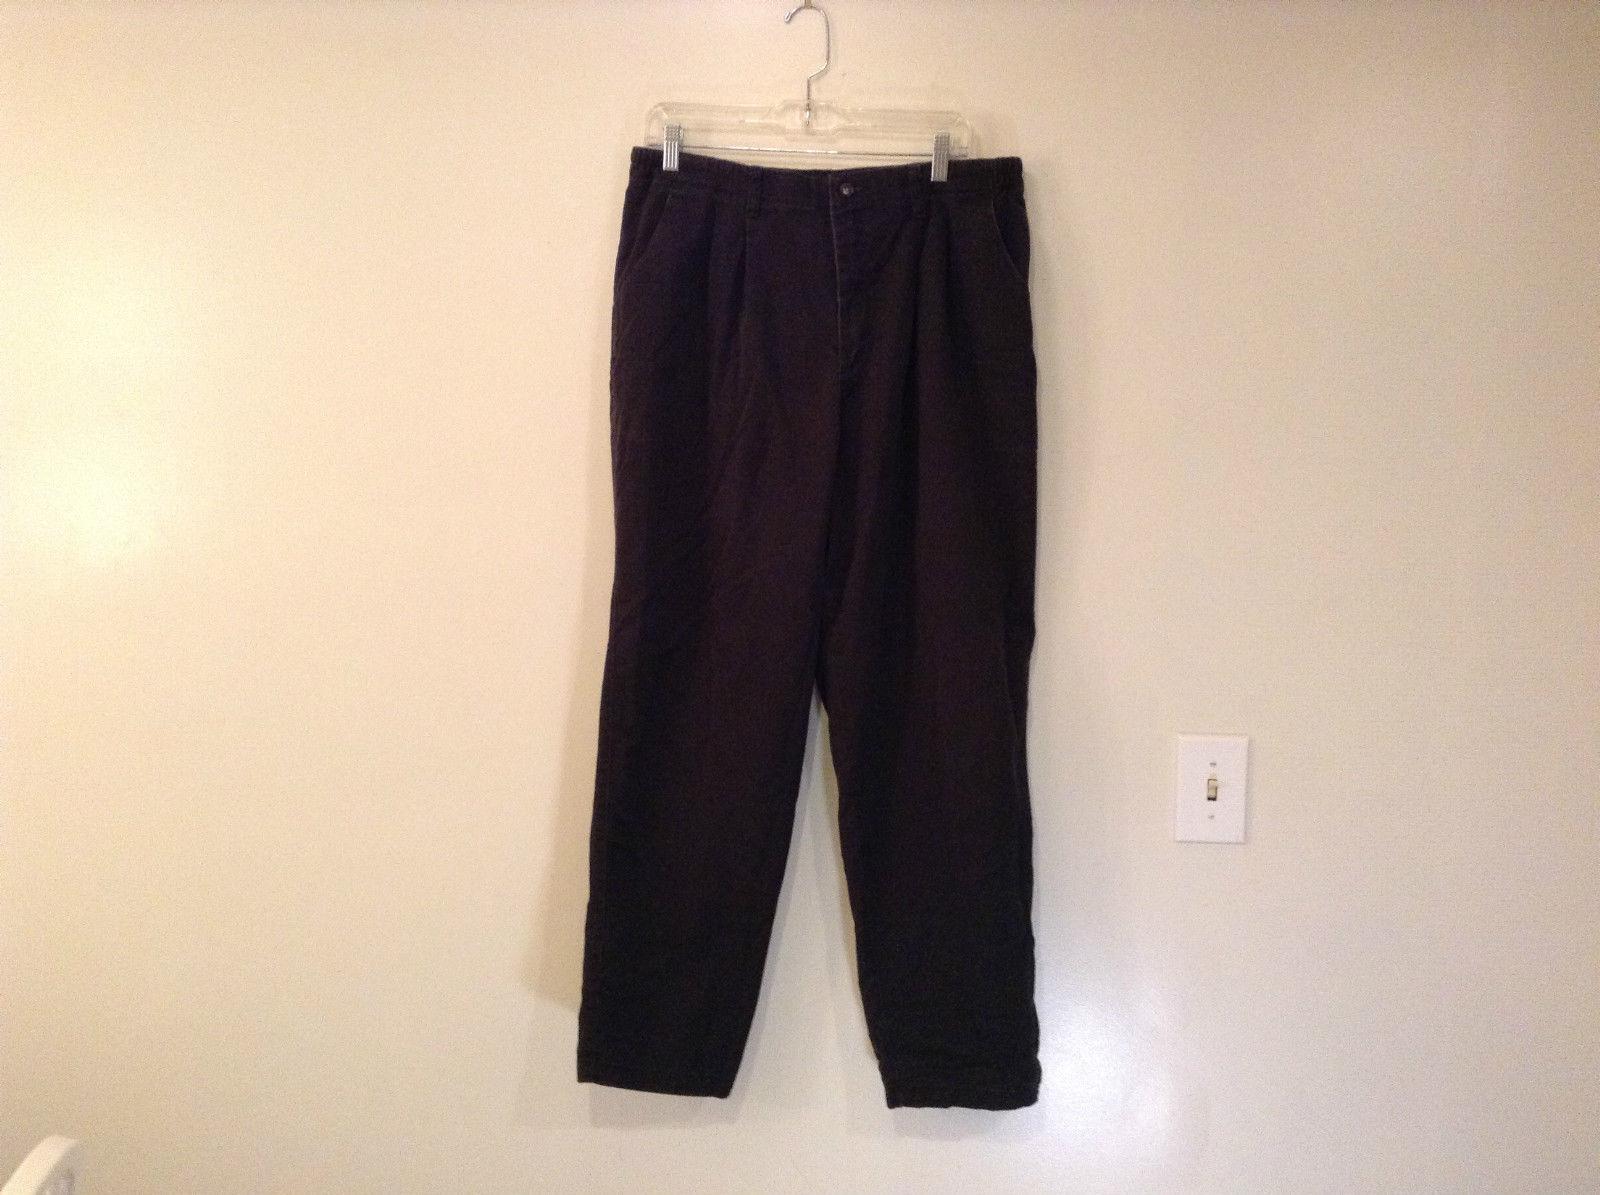 Lee Size 18 Medium Black Pants Elastic Inserts on Waist Pleats on Front